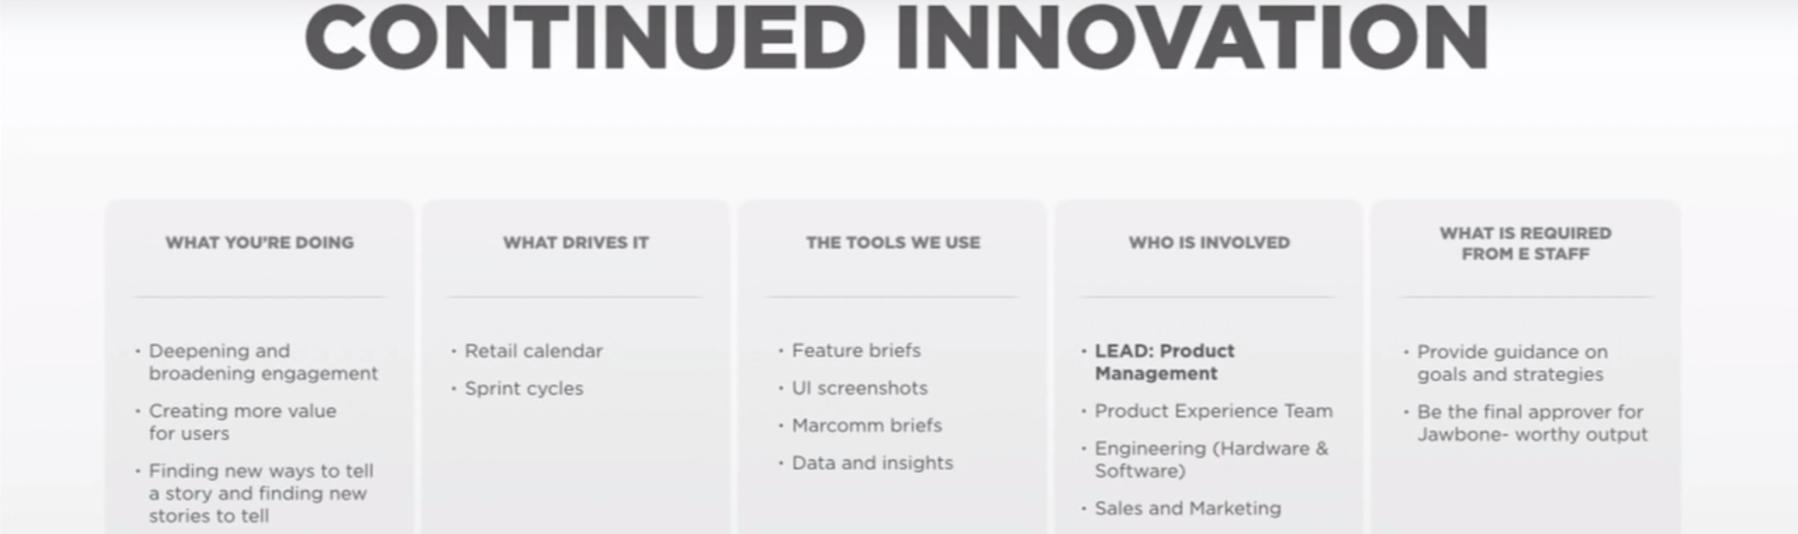 Хосейн Рахман: Как в Jawbone проектируют hardware-продукты - 16